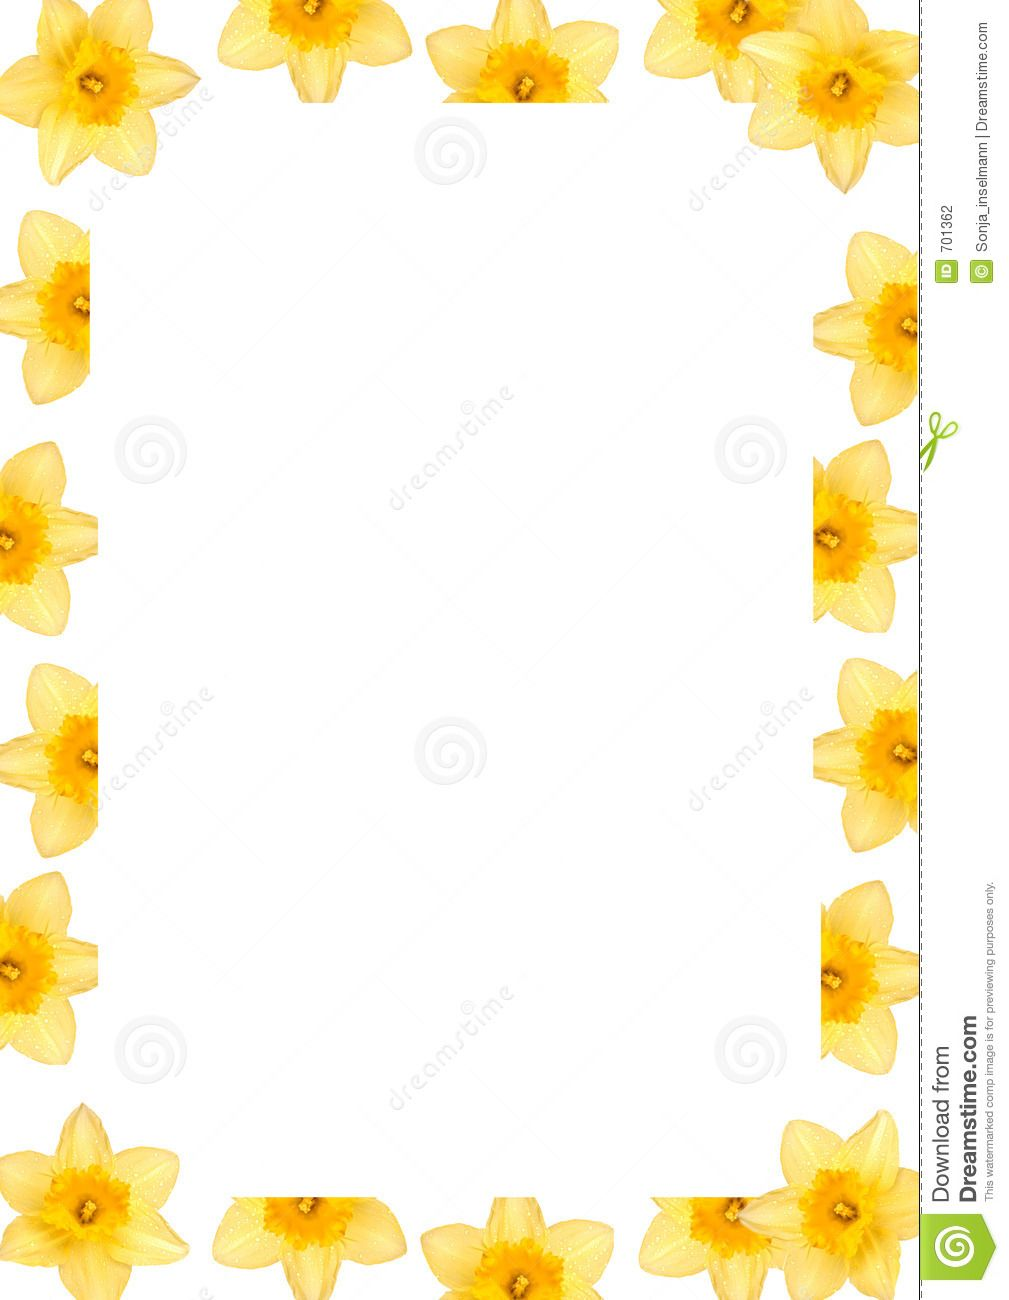 daffodil clip art - Google Search   Nutrition   Pinterest ...